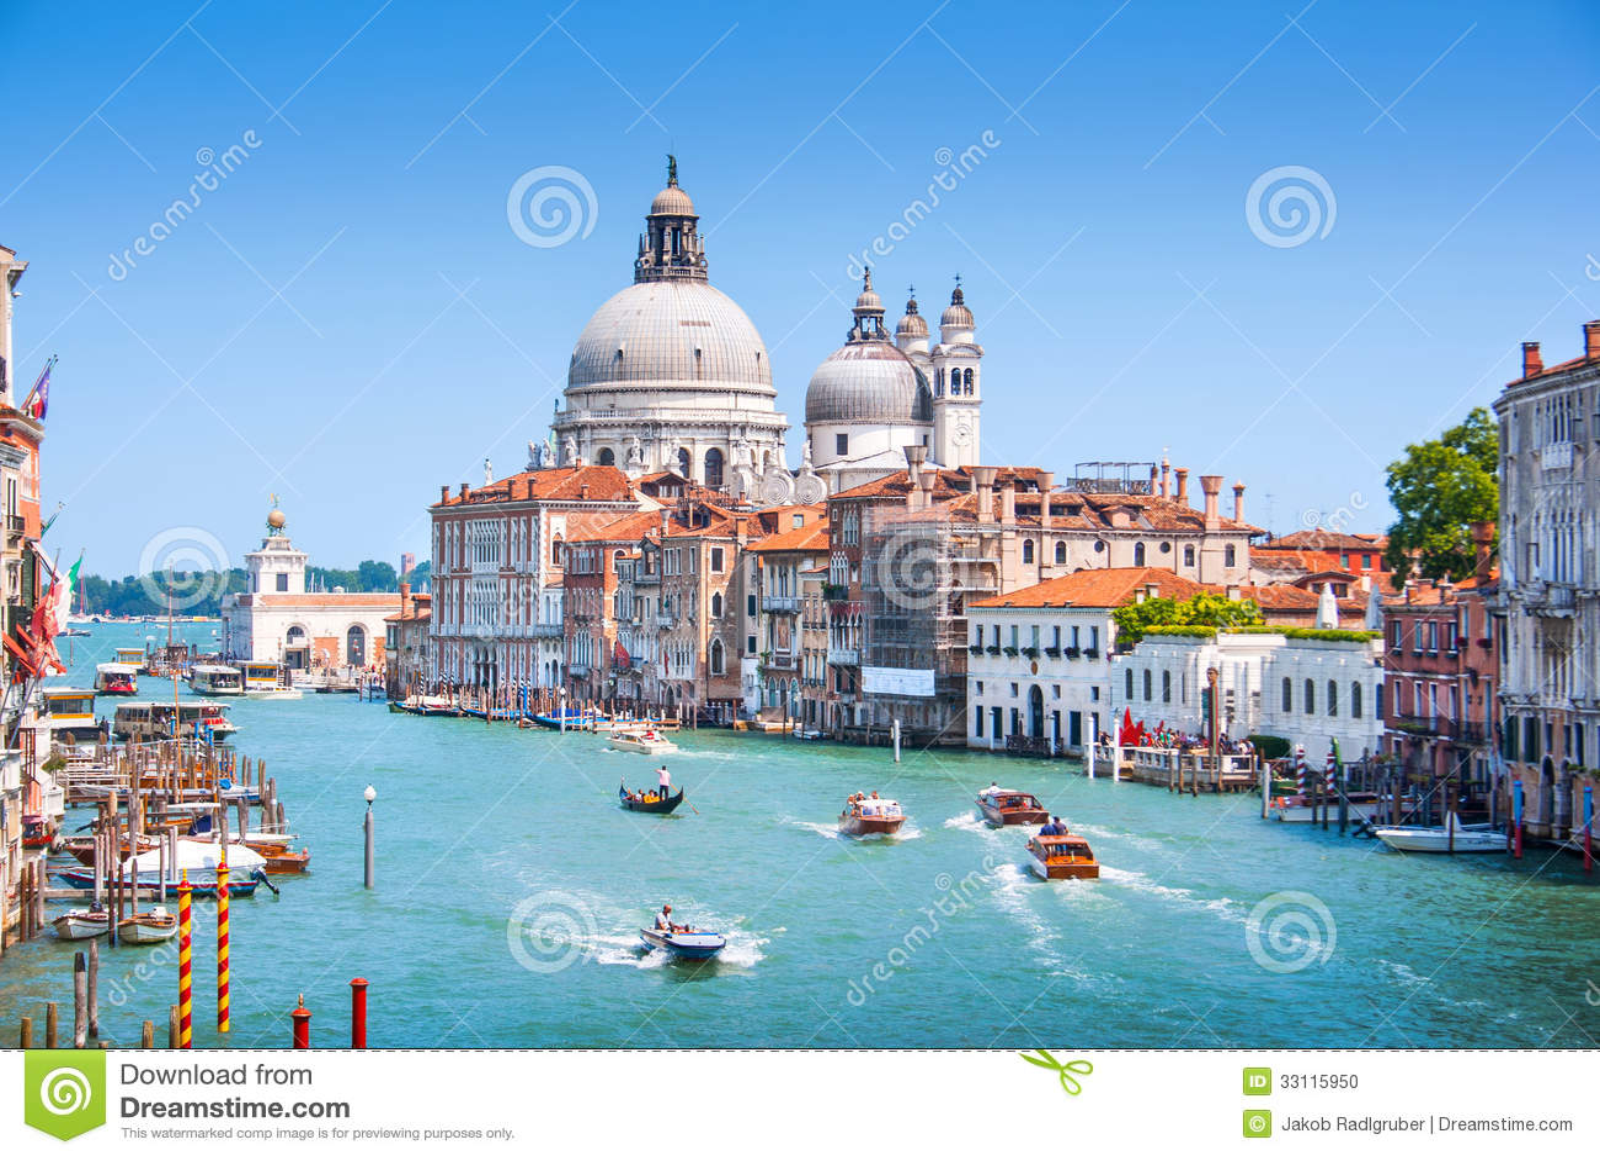 Kanaal Grande met Basiliekdi Santa Maria della Salute in Venetië, Italië